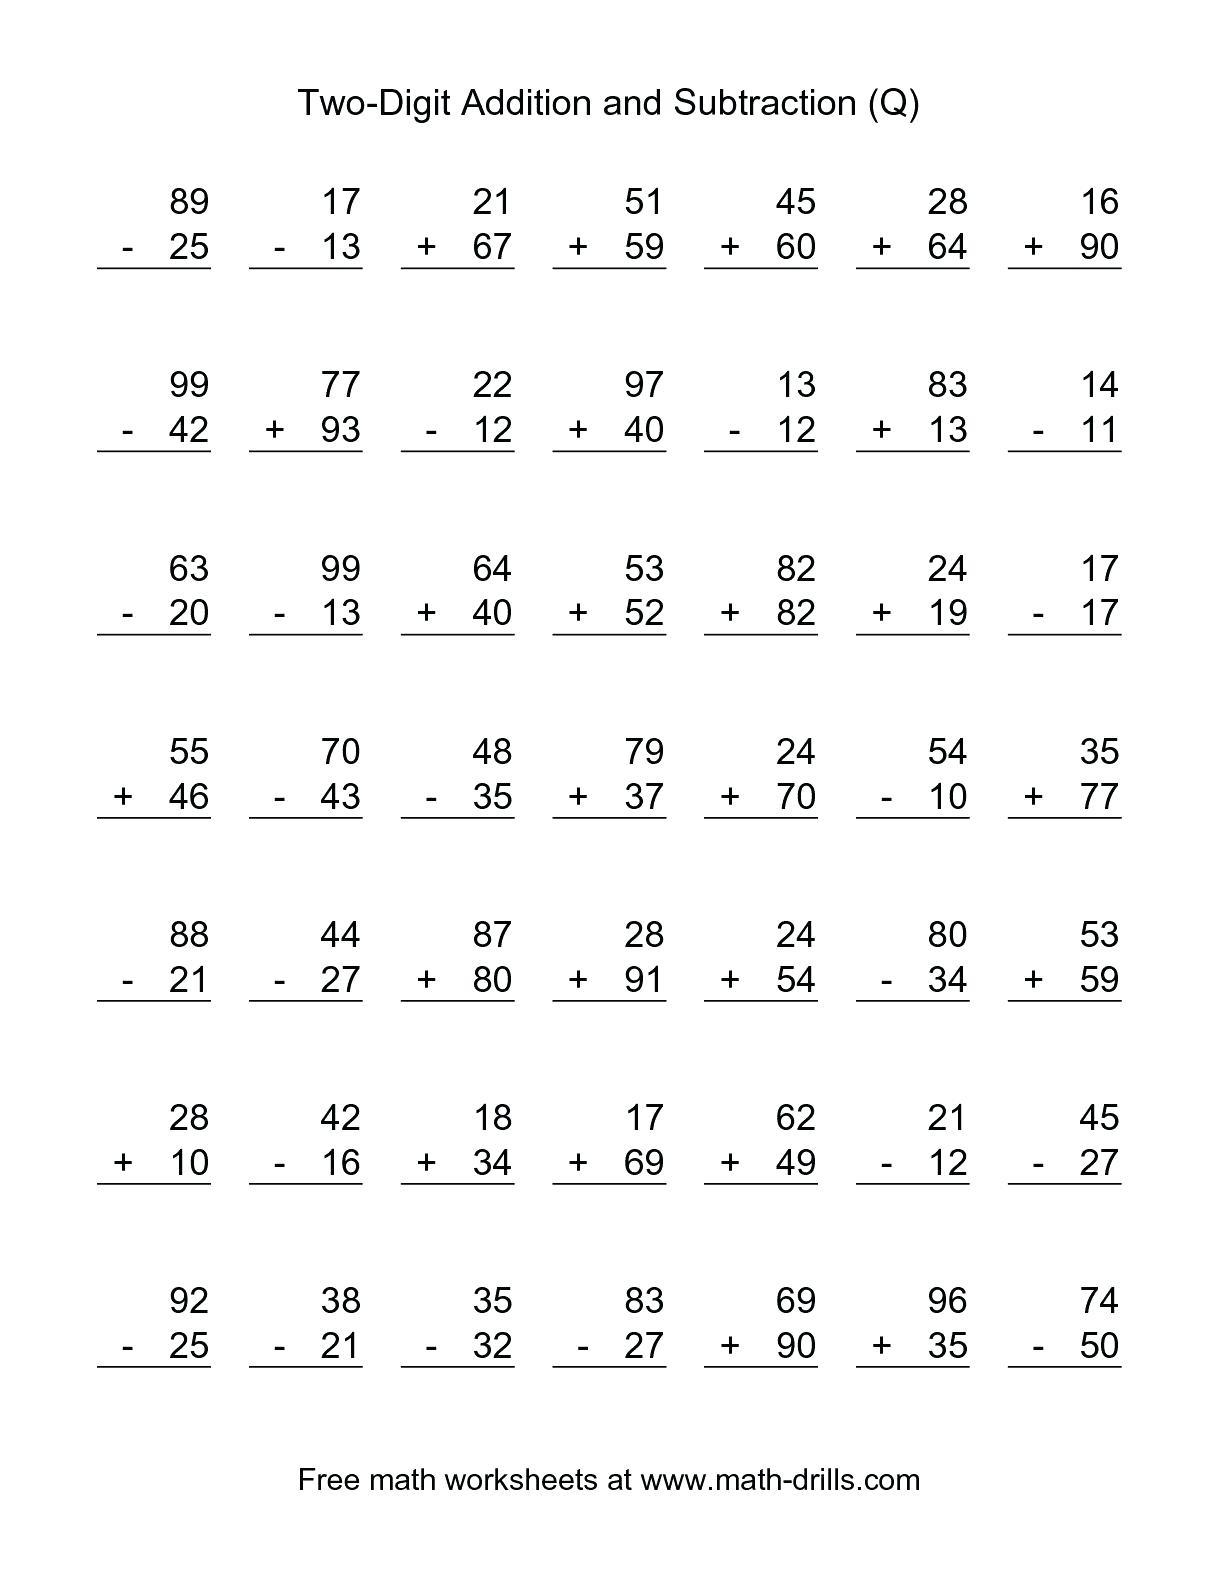 Free Printable 2Nd Grade Math Worksheets Counting Money Worksheets | Printable 2Nd Grade Math Worksheets